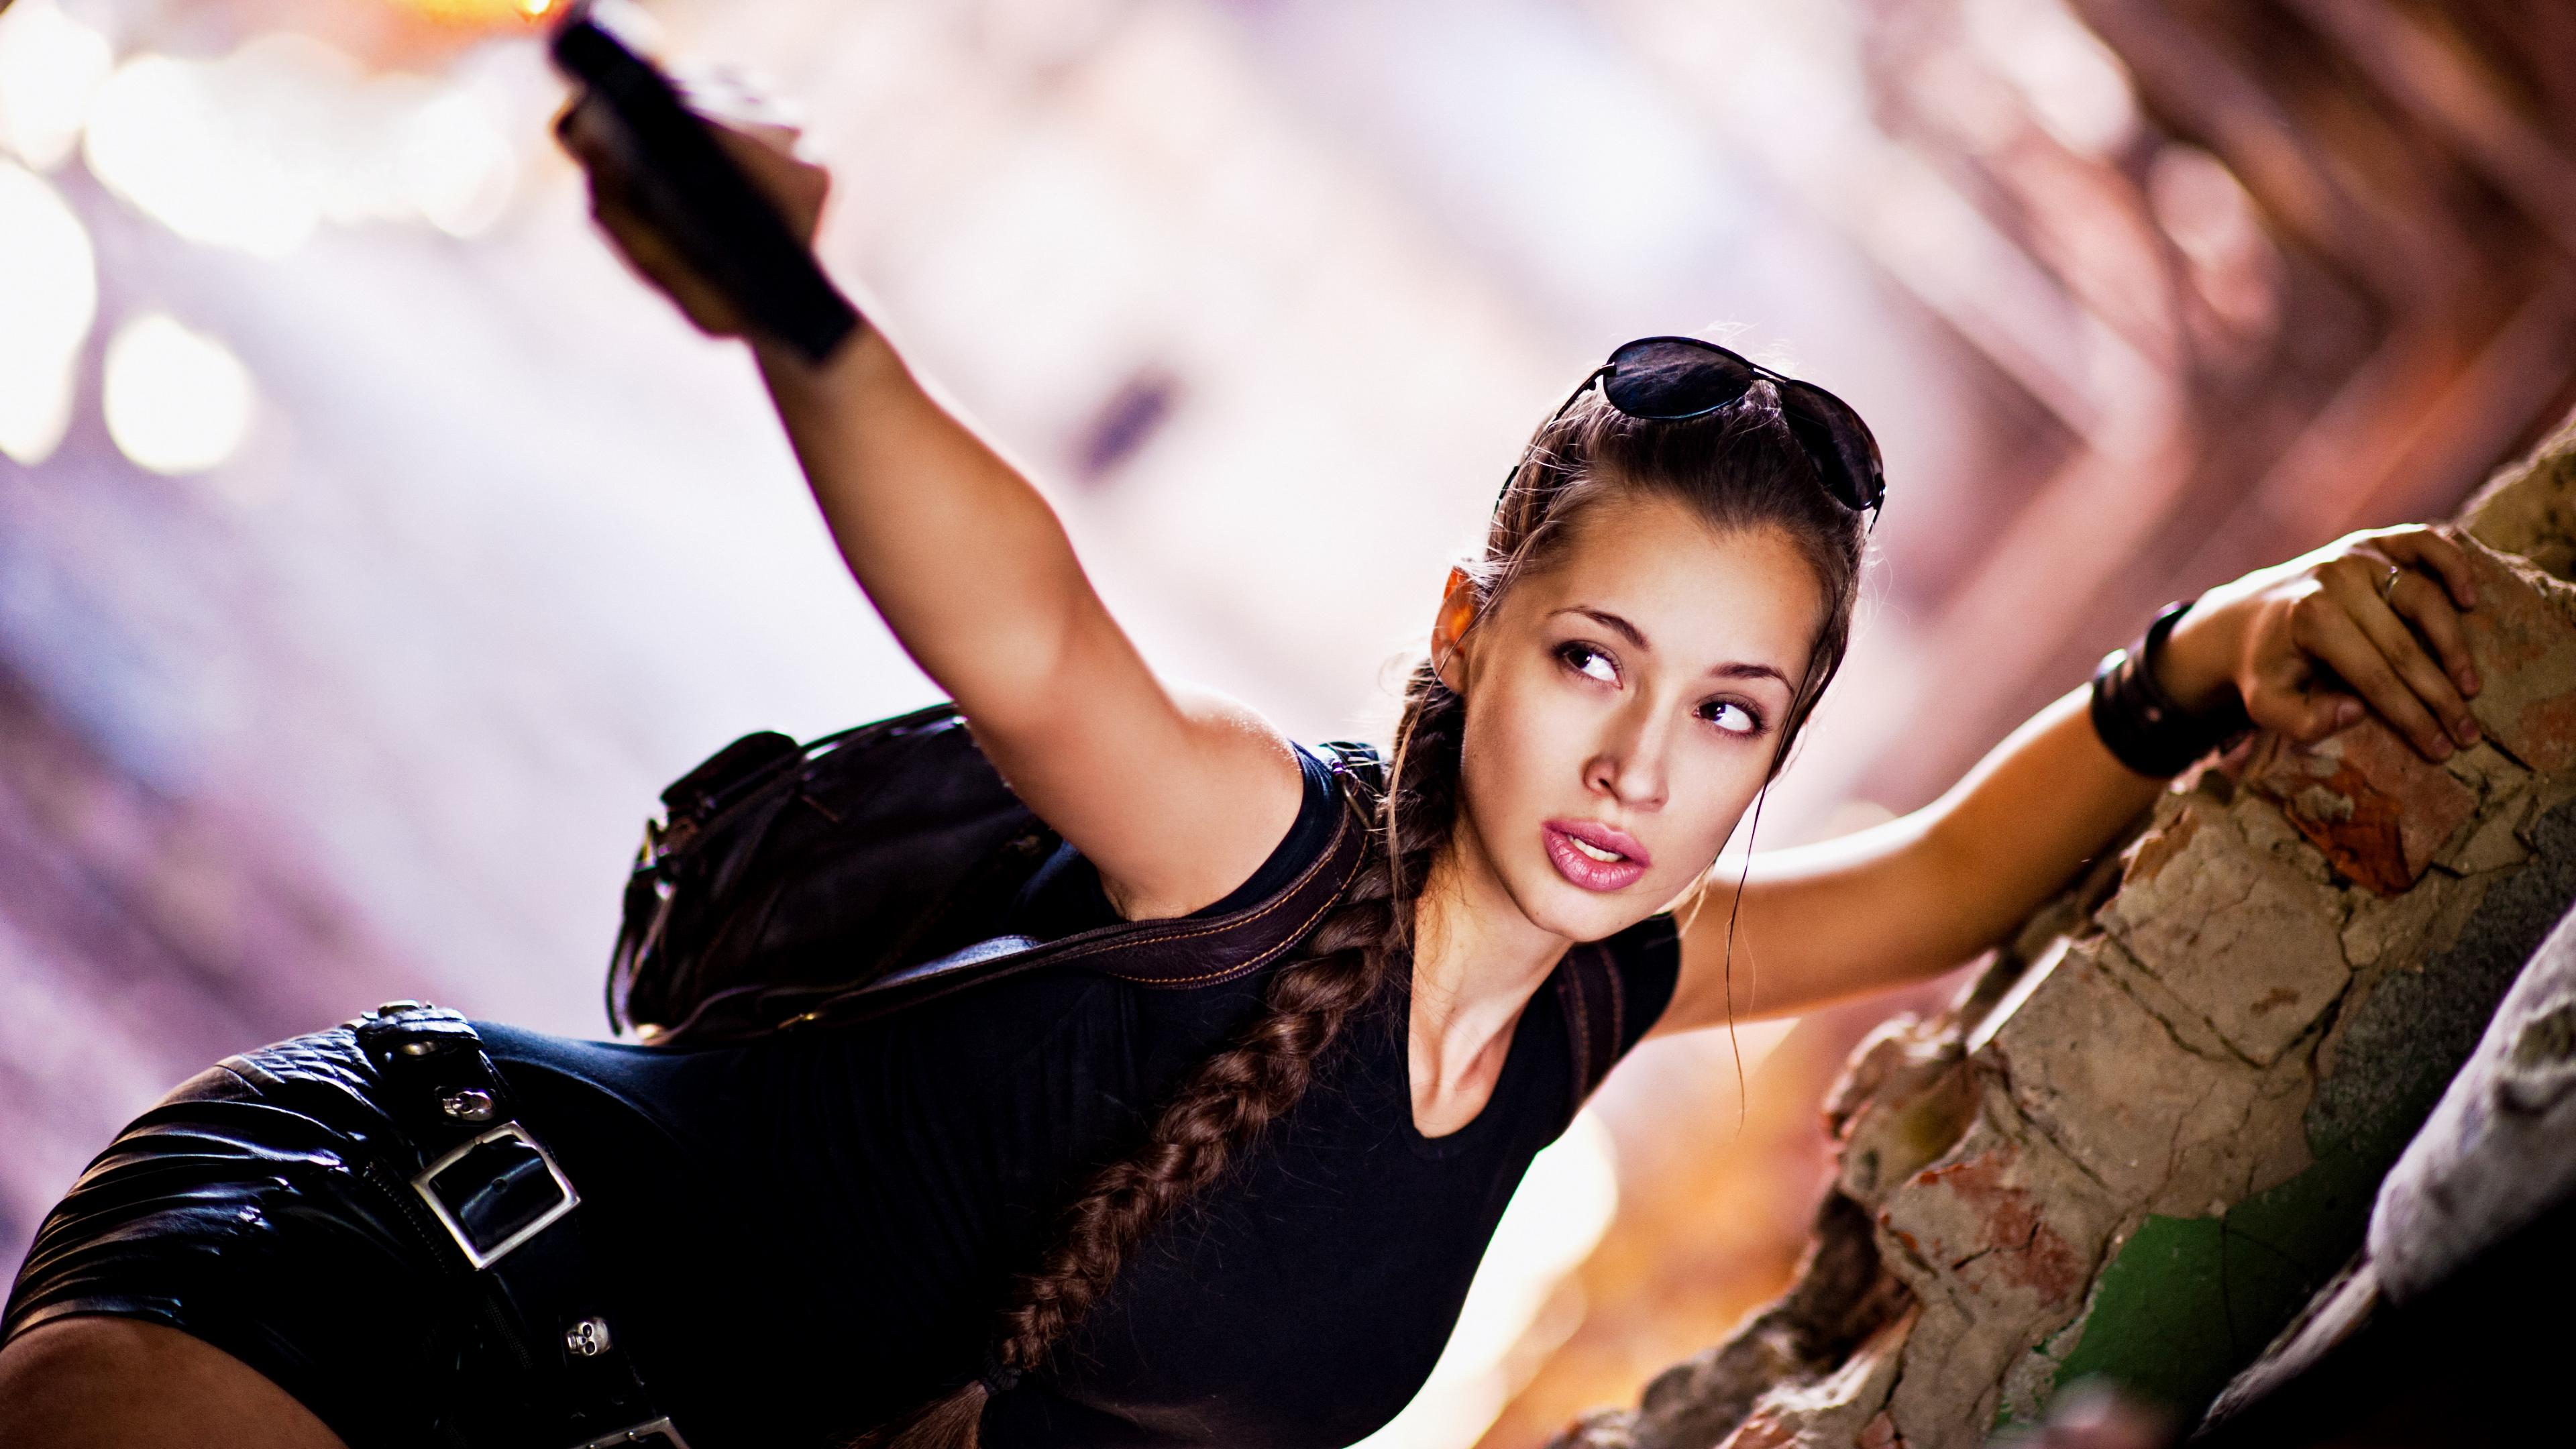 lara croft cosplay 1575664729 - Lara Croft Cosplay -